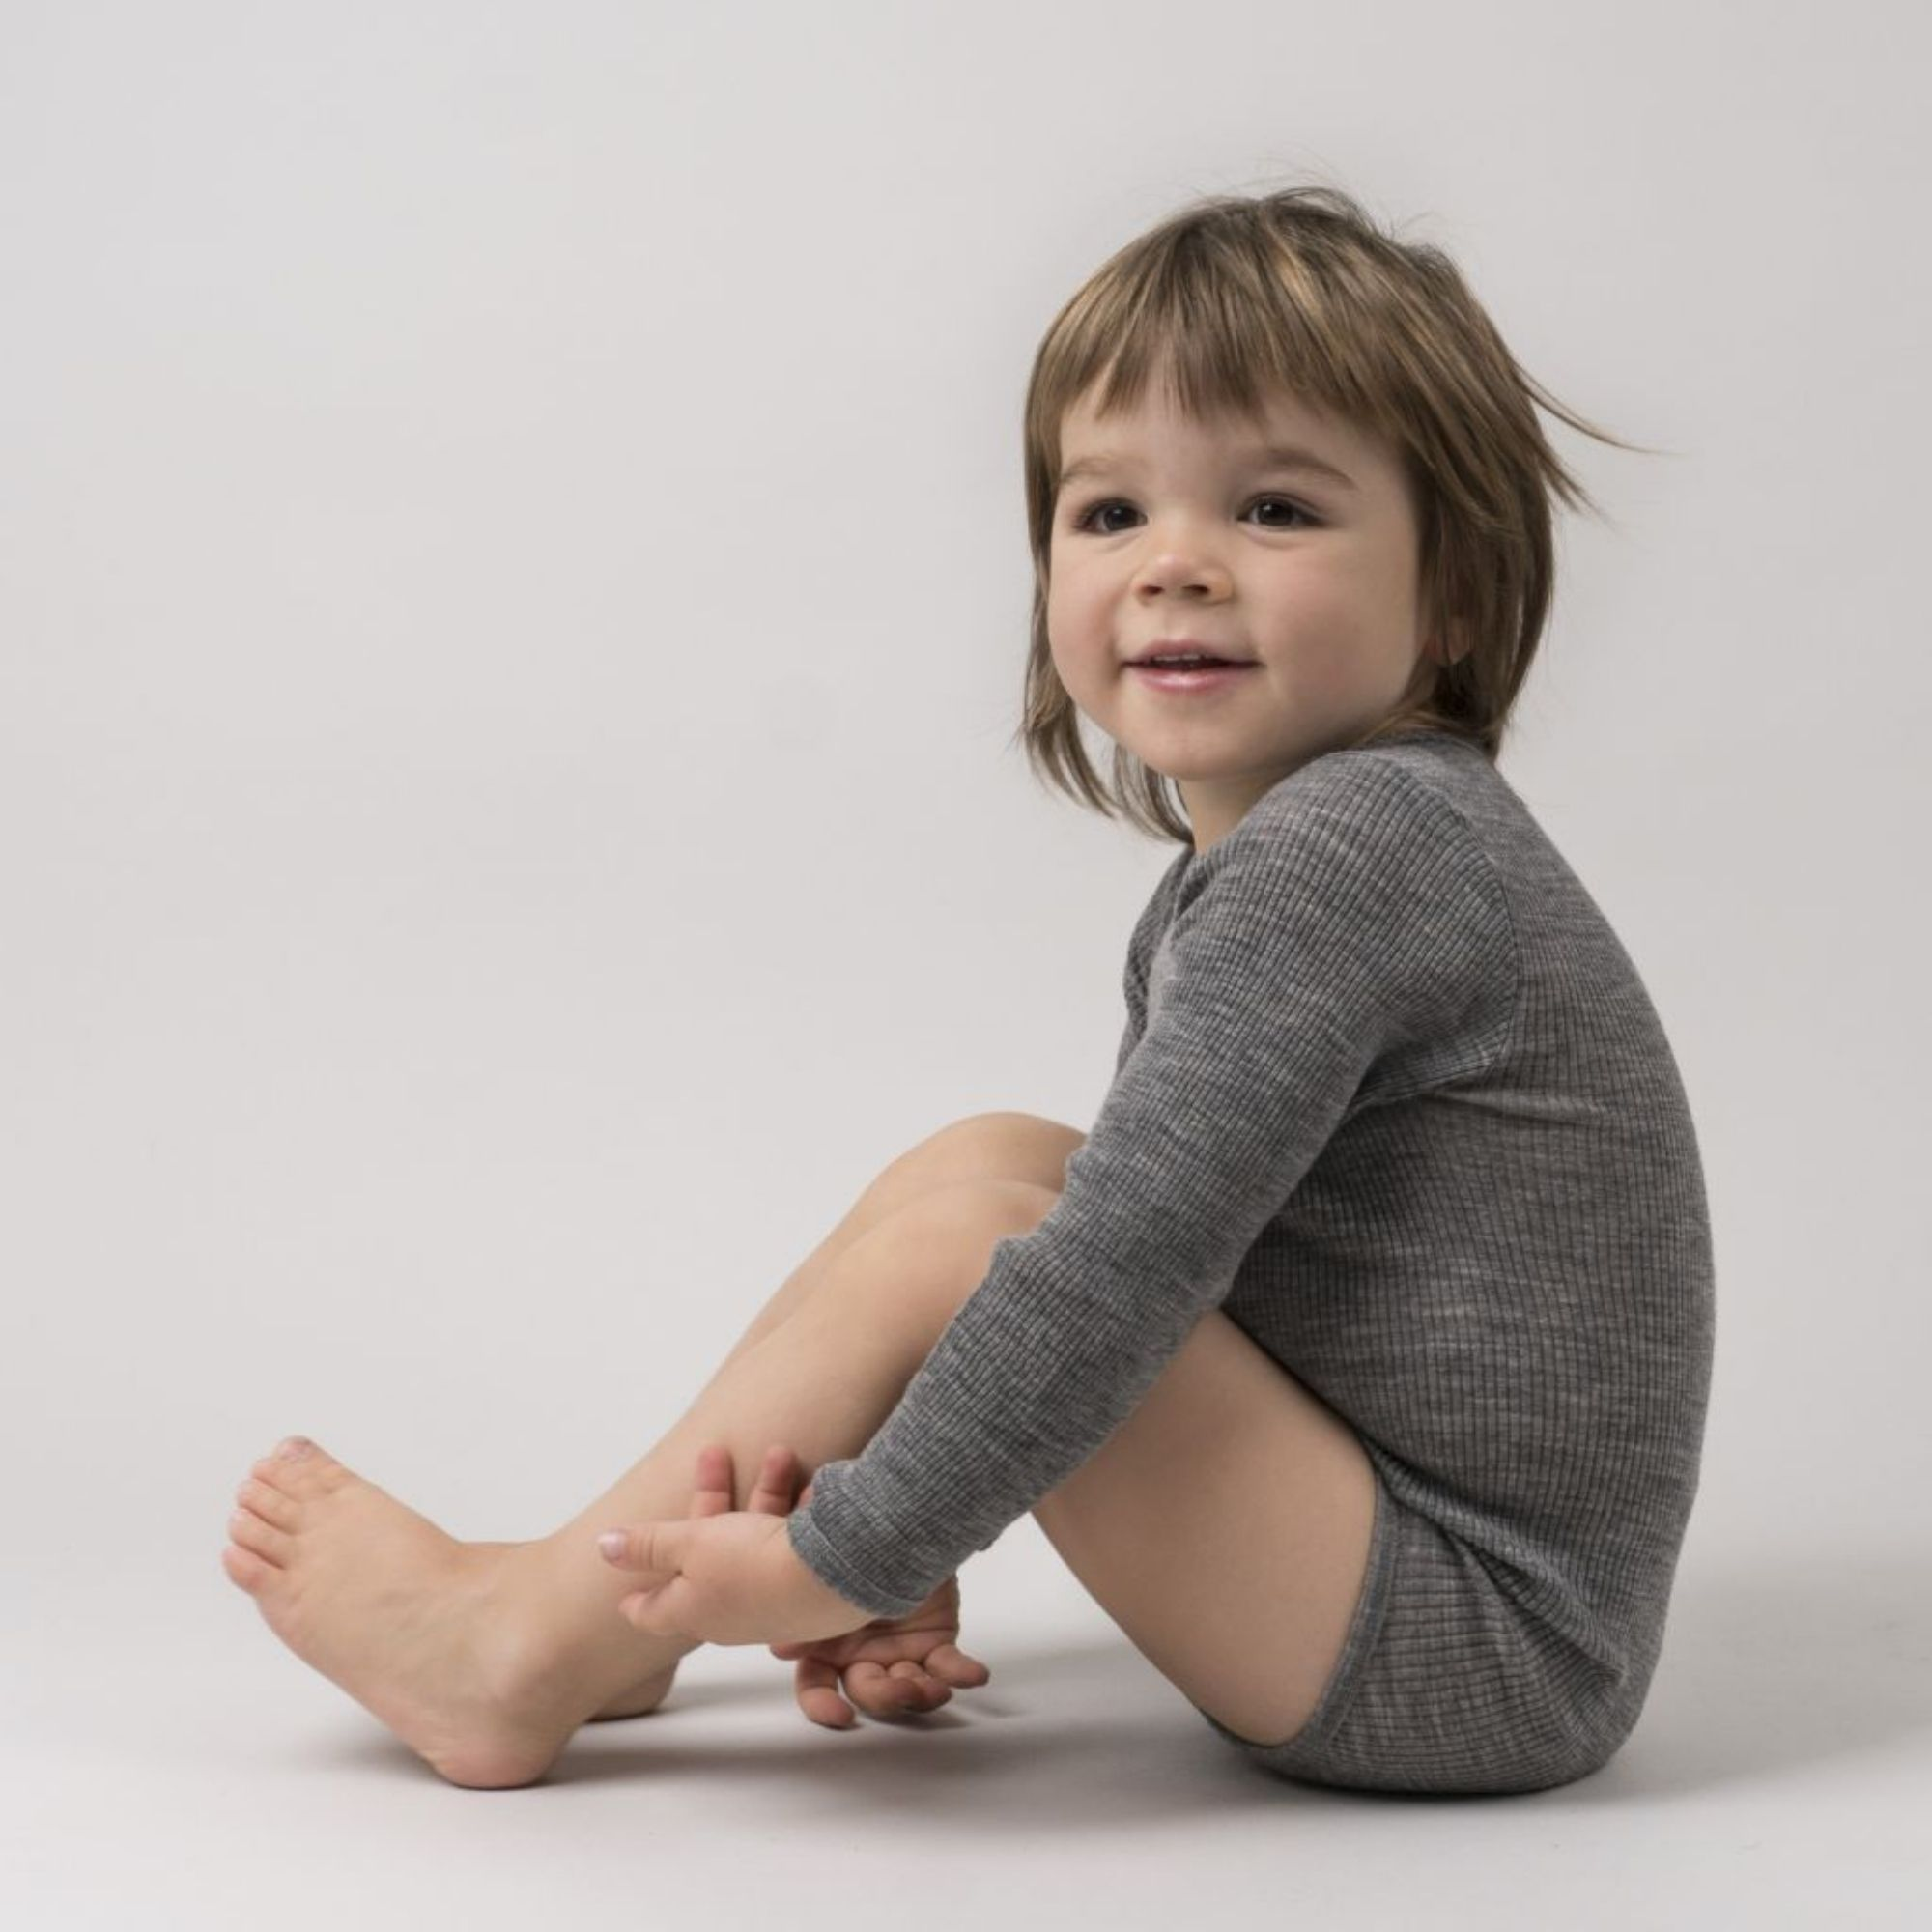 MINIMALISMA - Body bébé - 100 % laine mérinos - Gris mélangé